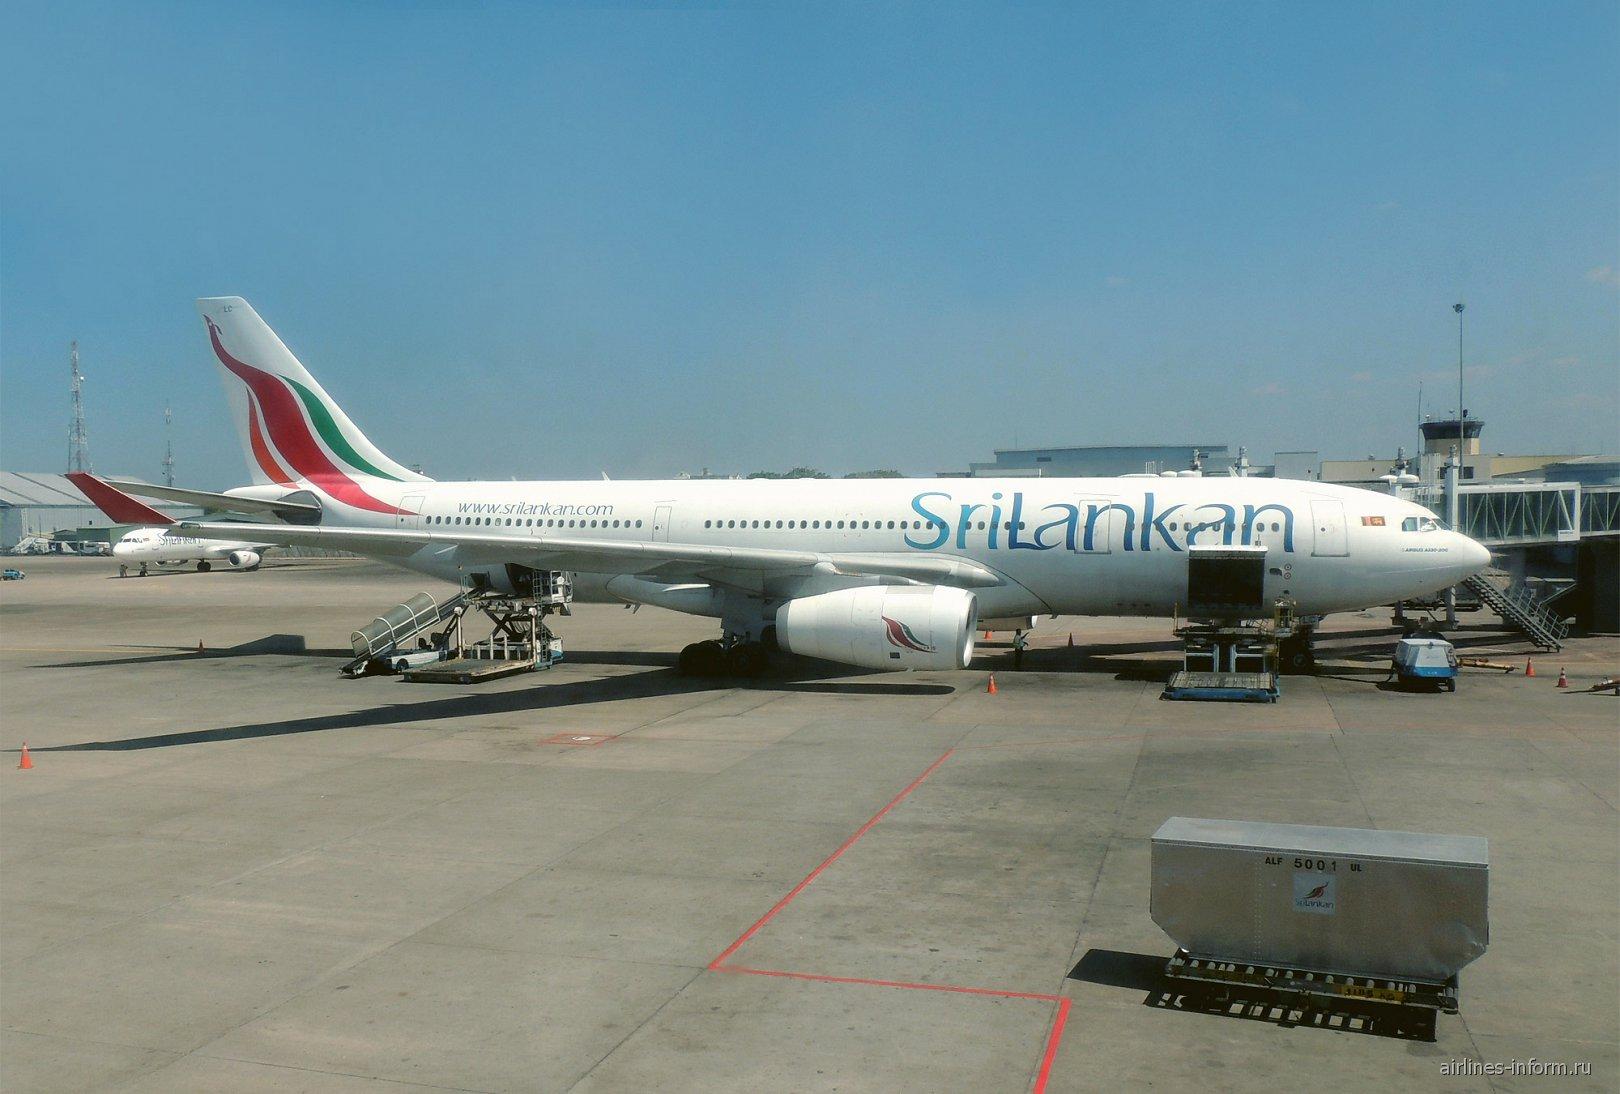 Airbus A330-200 авиакомпании SriLankan в аэропорту Коломбо